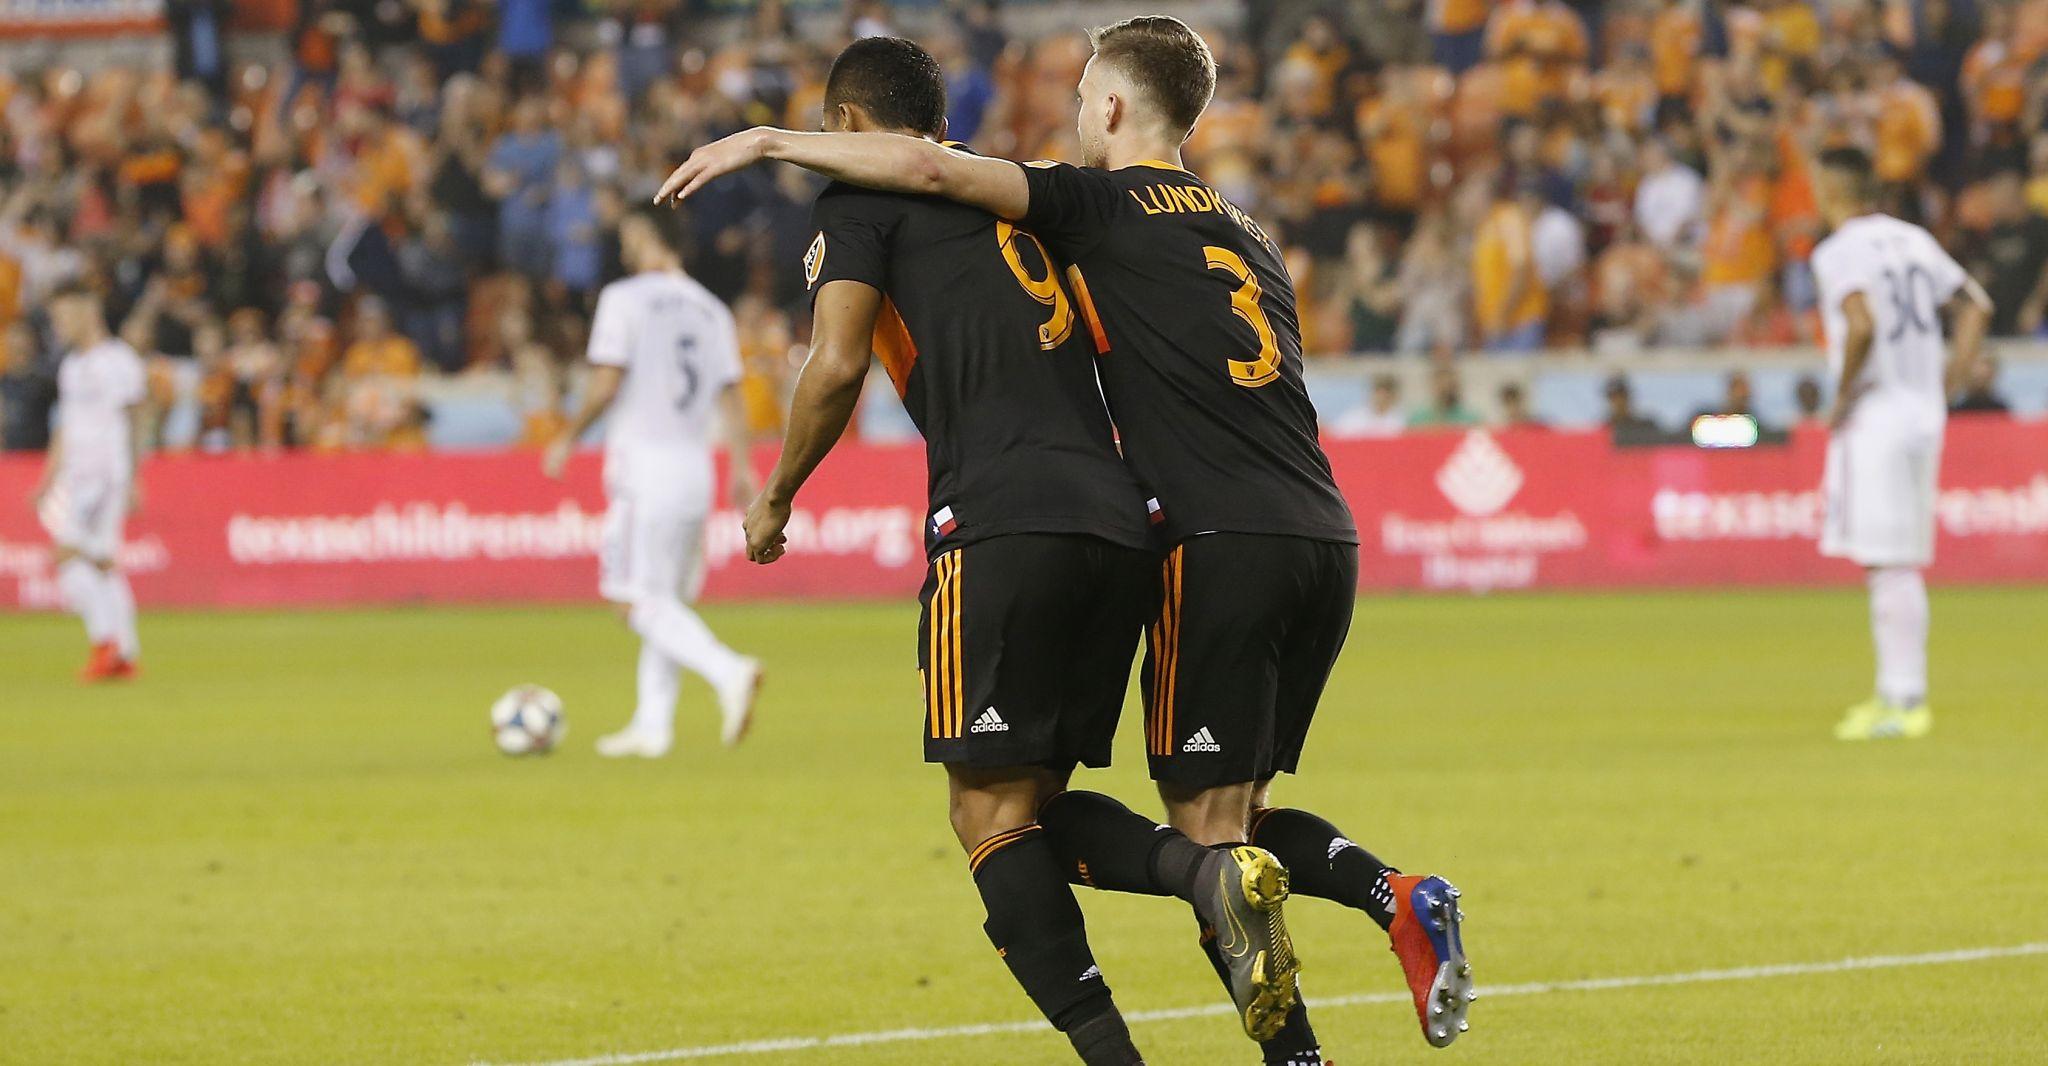 Dynamo, Real Salt Lake play to draw in MLS opener